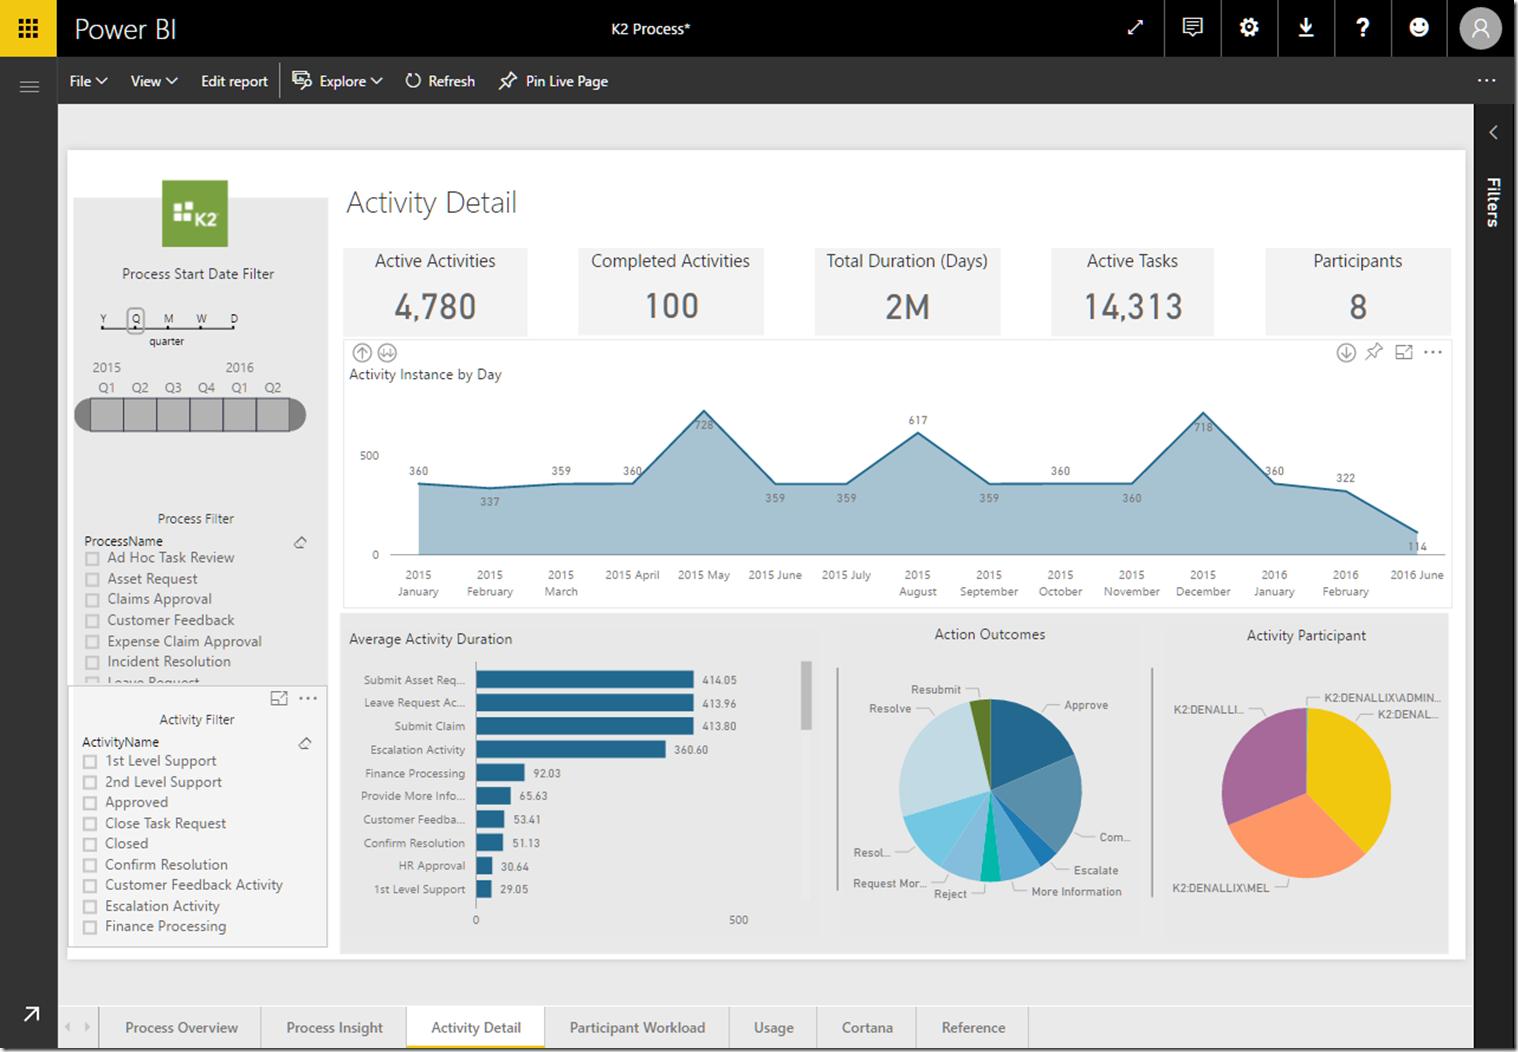 ac8c1693 da21 44c0 834c ccf6587ee77c Explore your K2 Process Analytics Data with Power BI